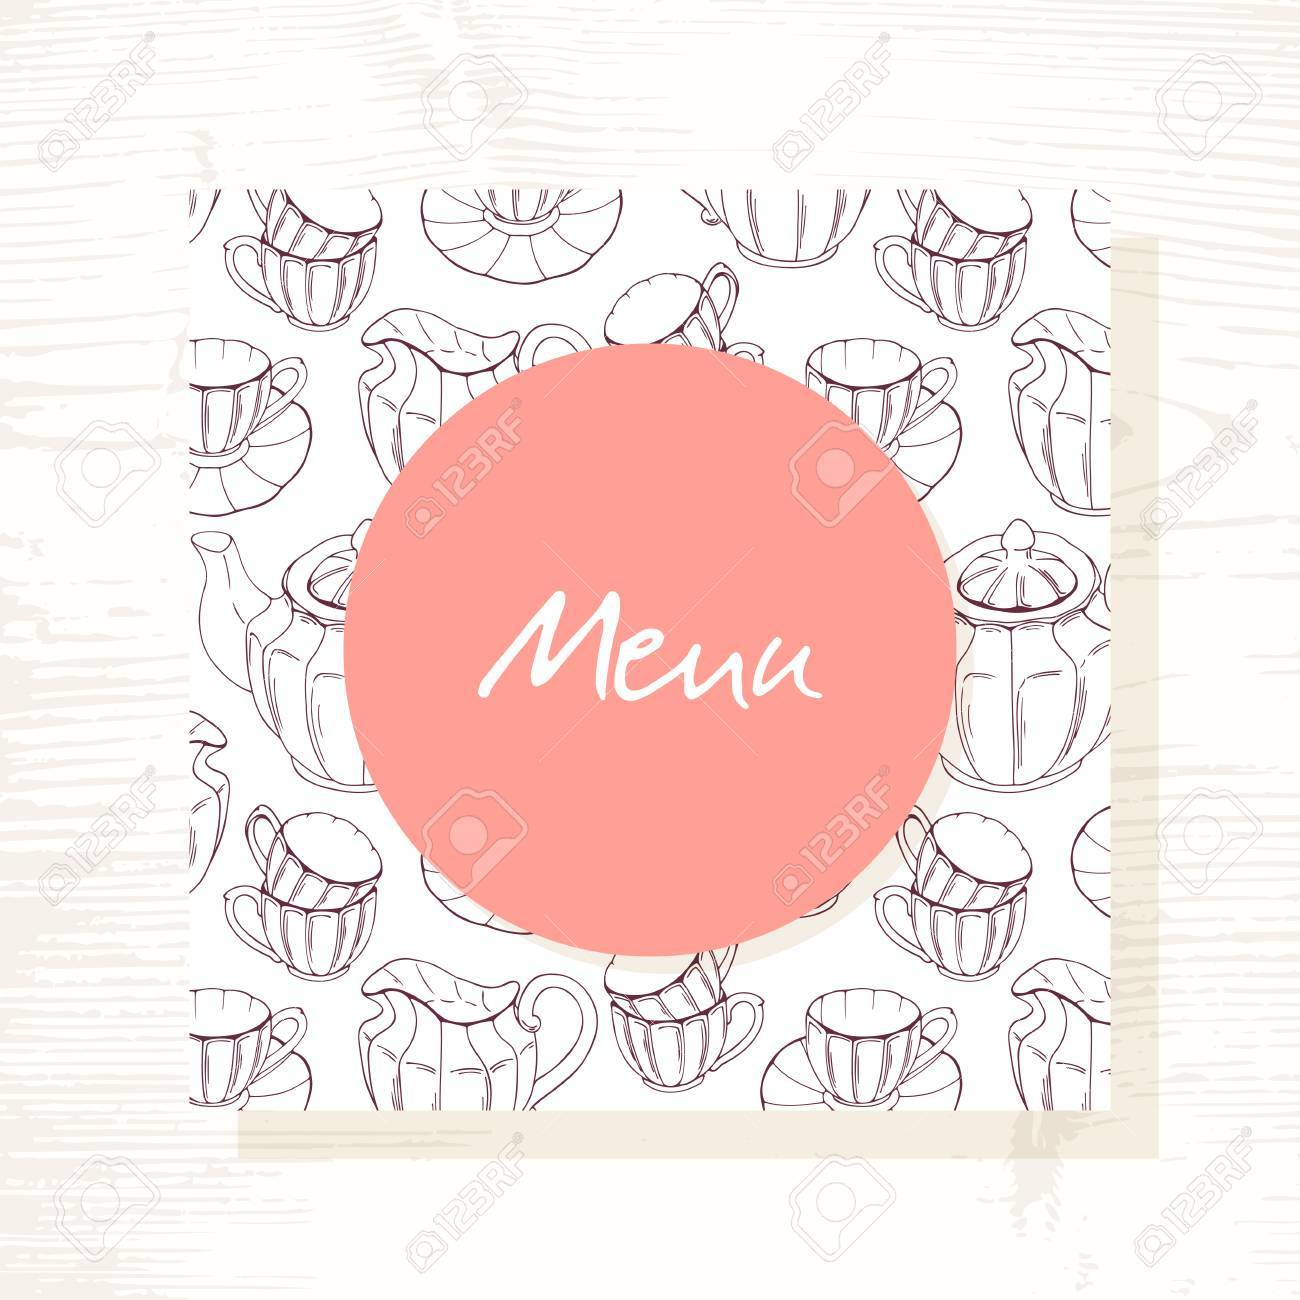 tea room menu template with tea service in vector hand drawn